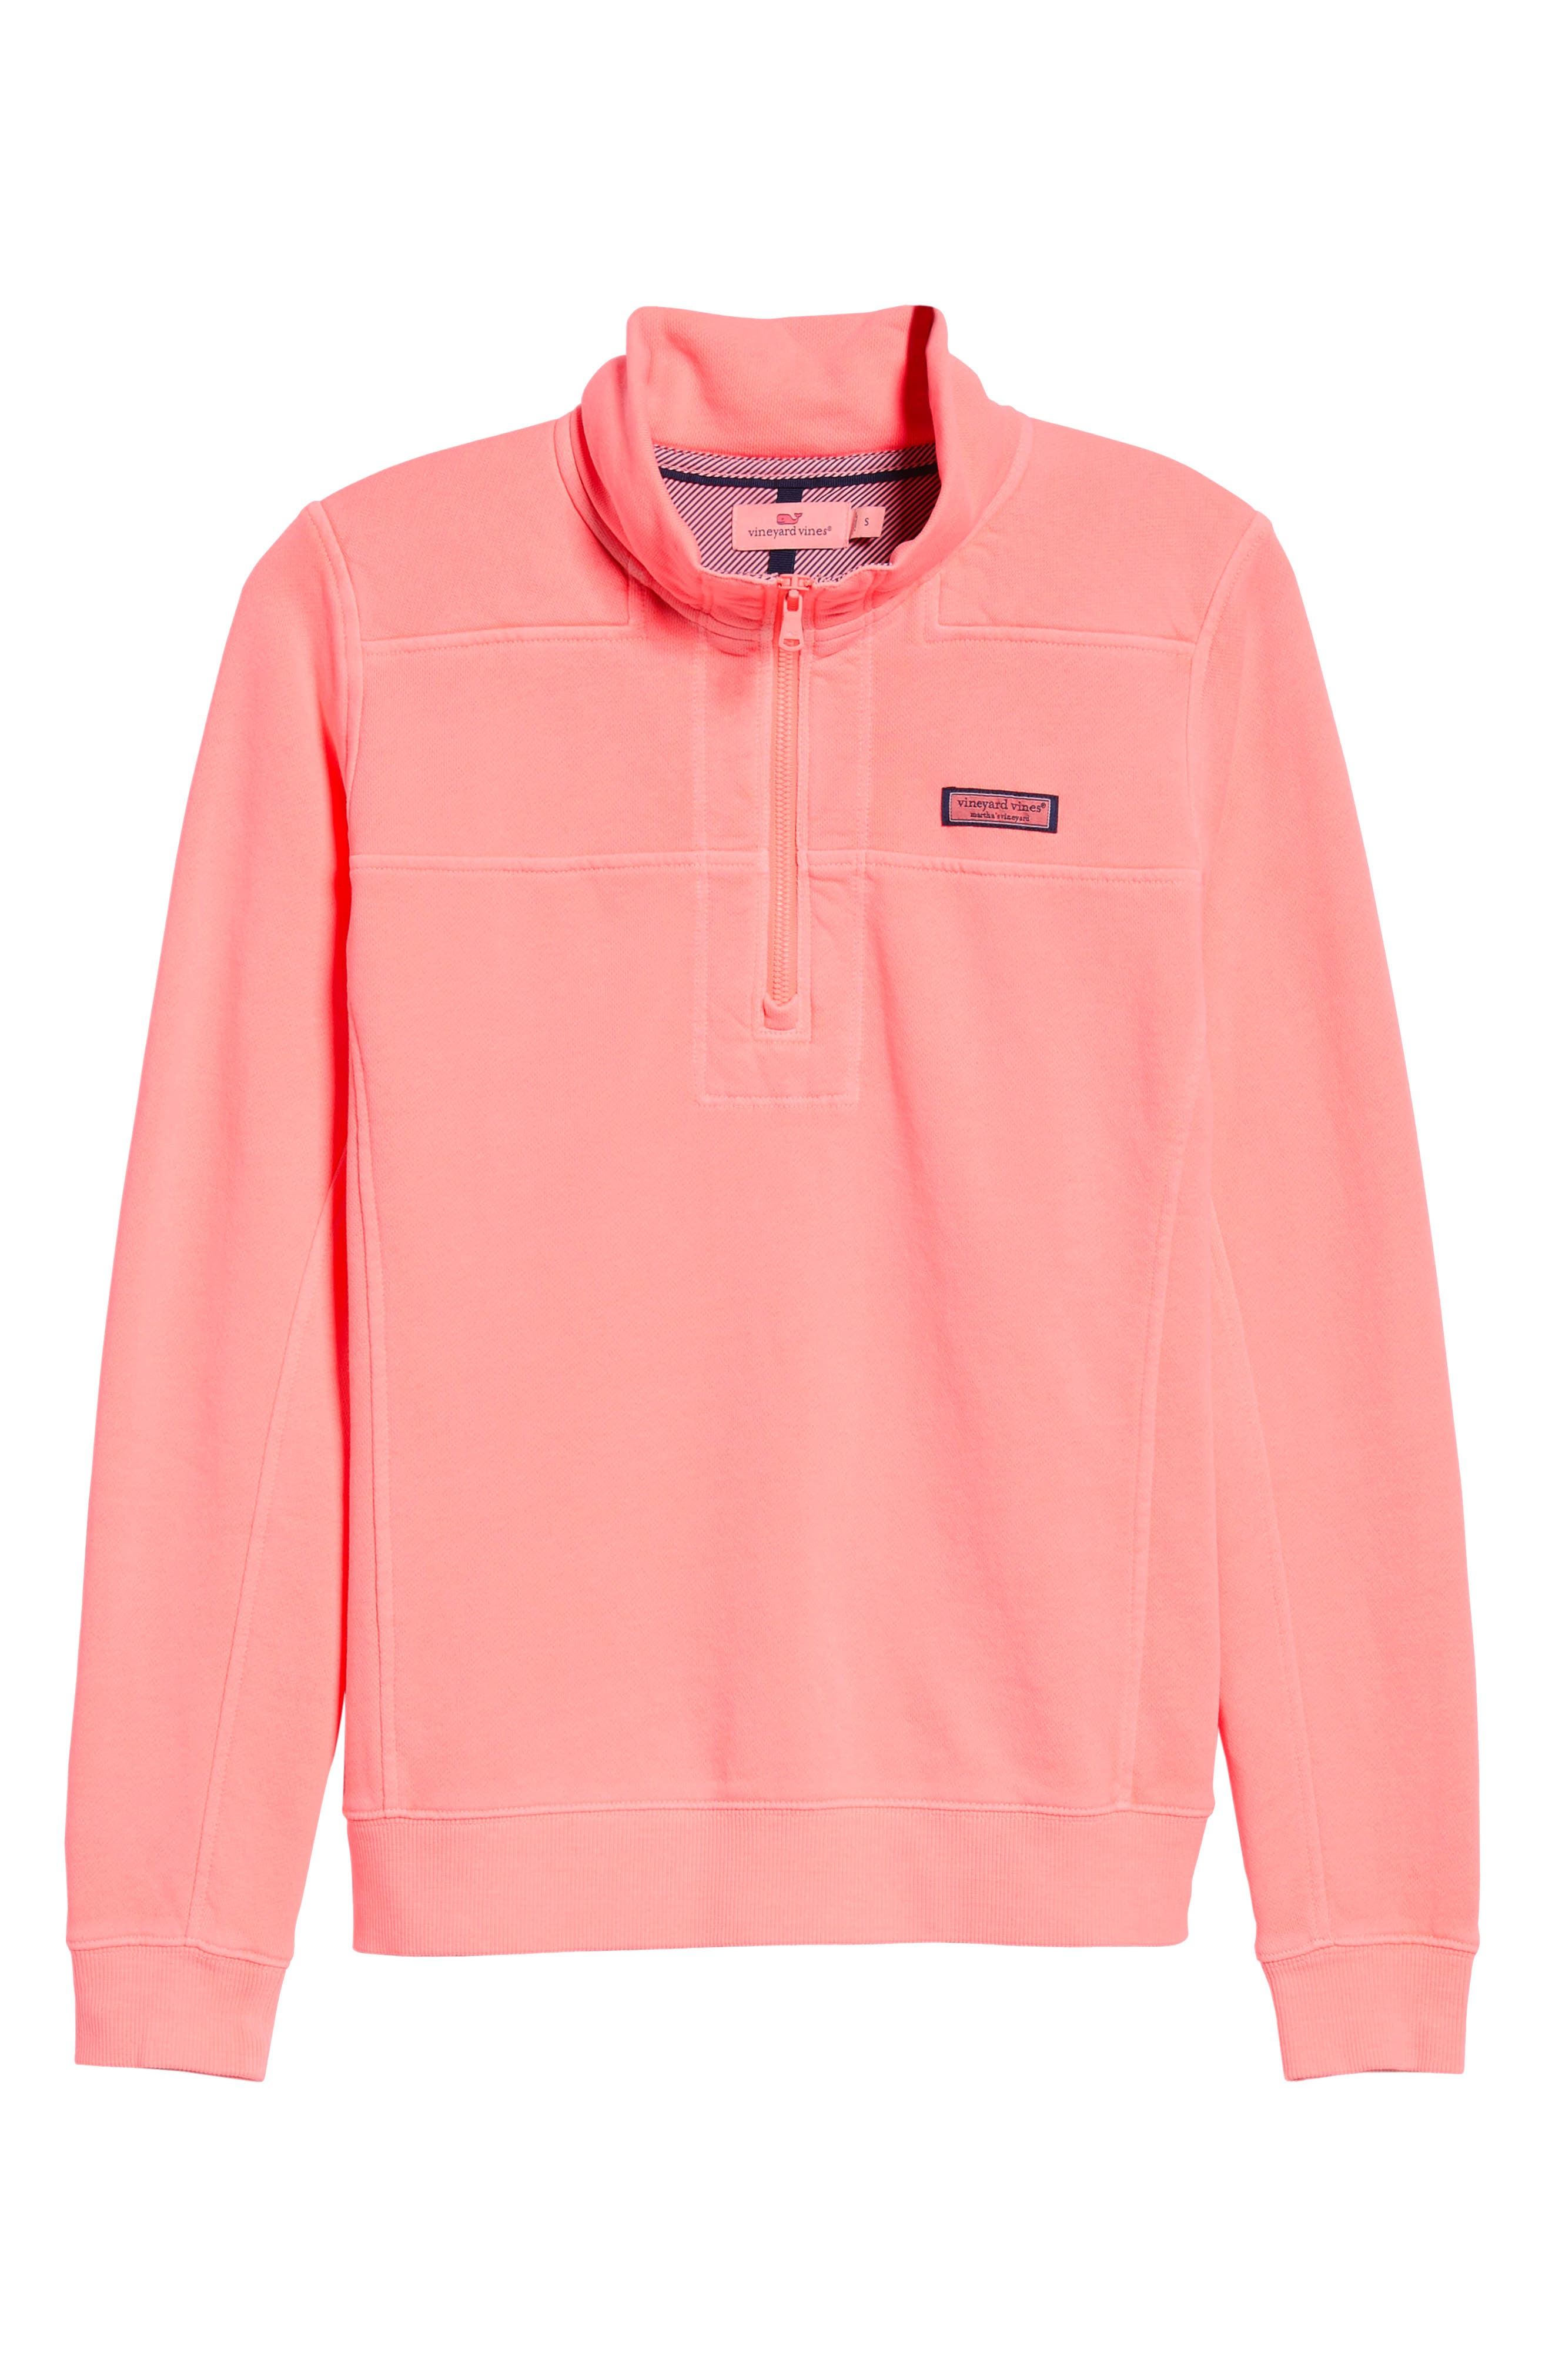 VINEYARD VINES,                             Garment Dyed Classic Shep Pullover,                             Alternate thumbnail 6, color,                             655